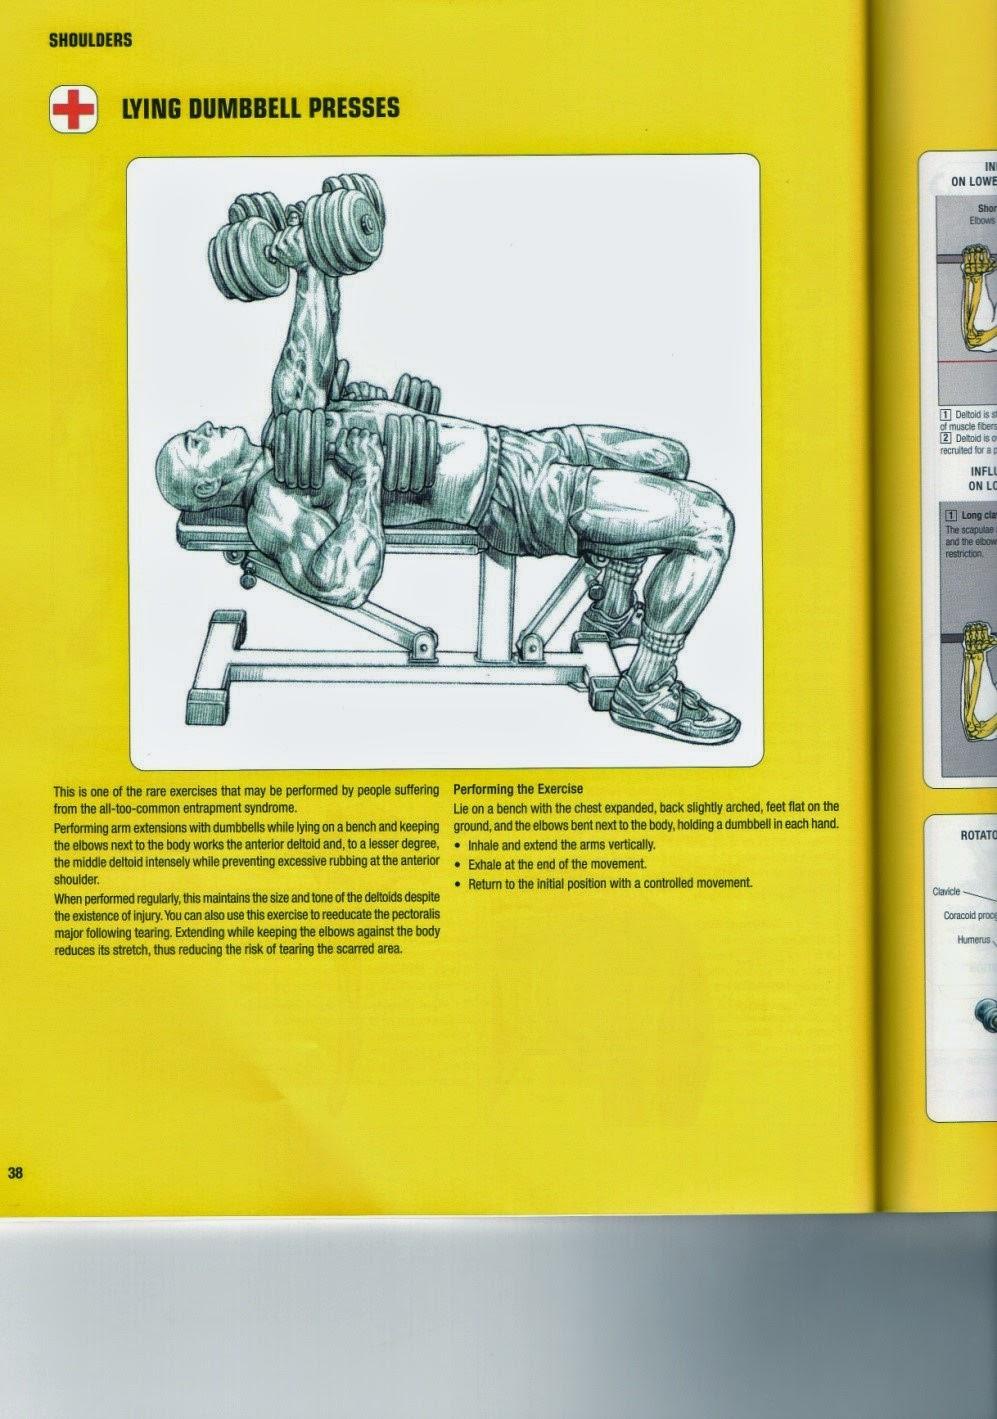 how to fix lifters shoulder